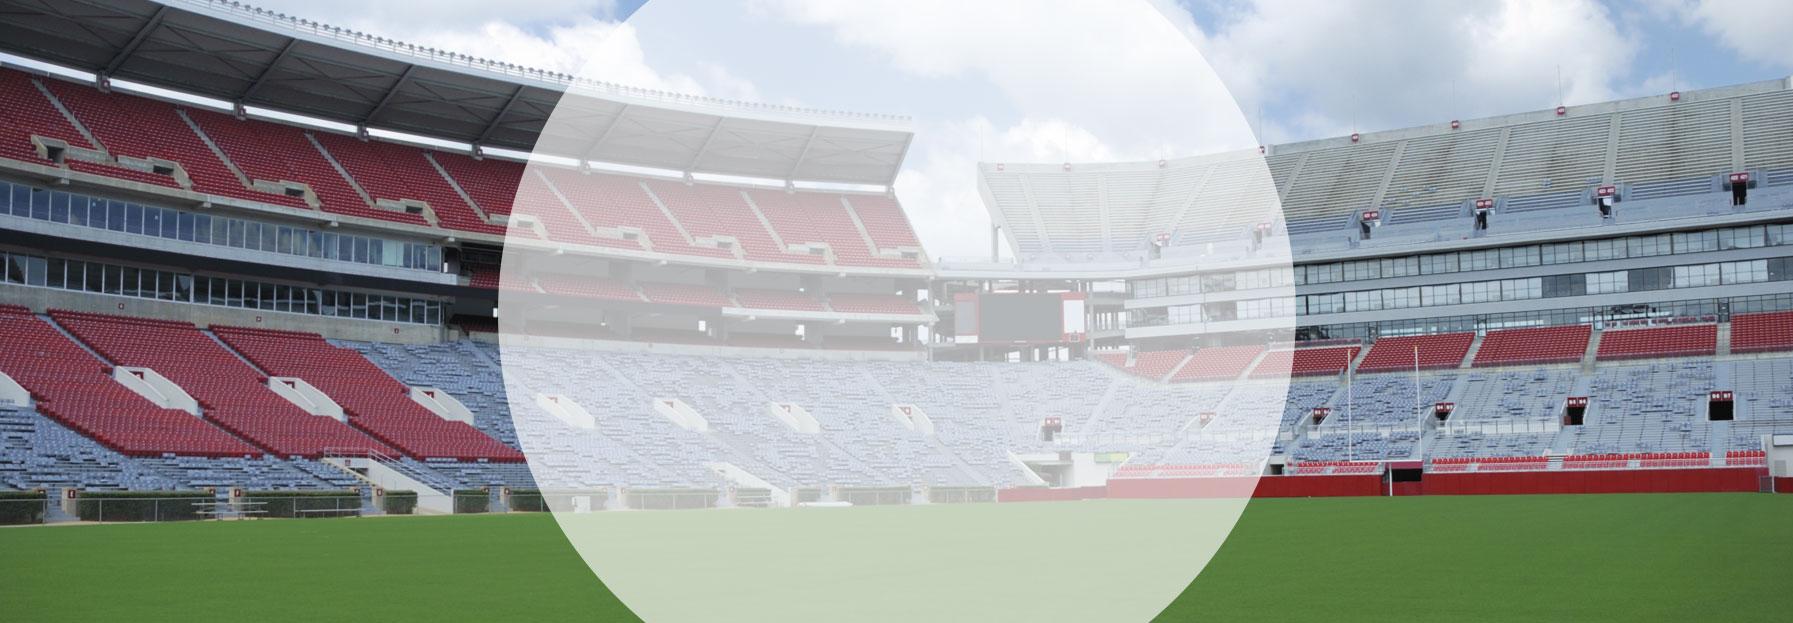 Stadium Cleaning Jani King